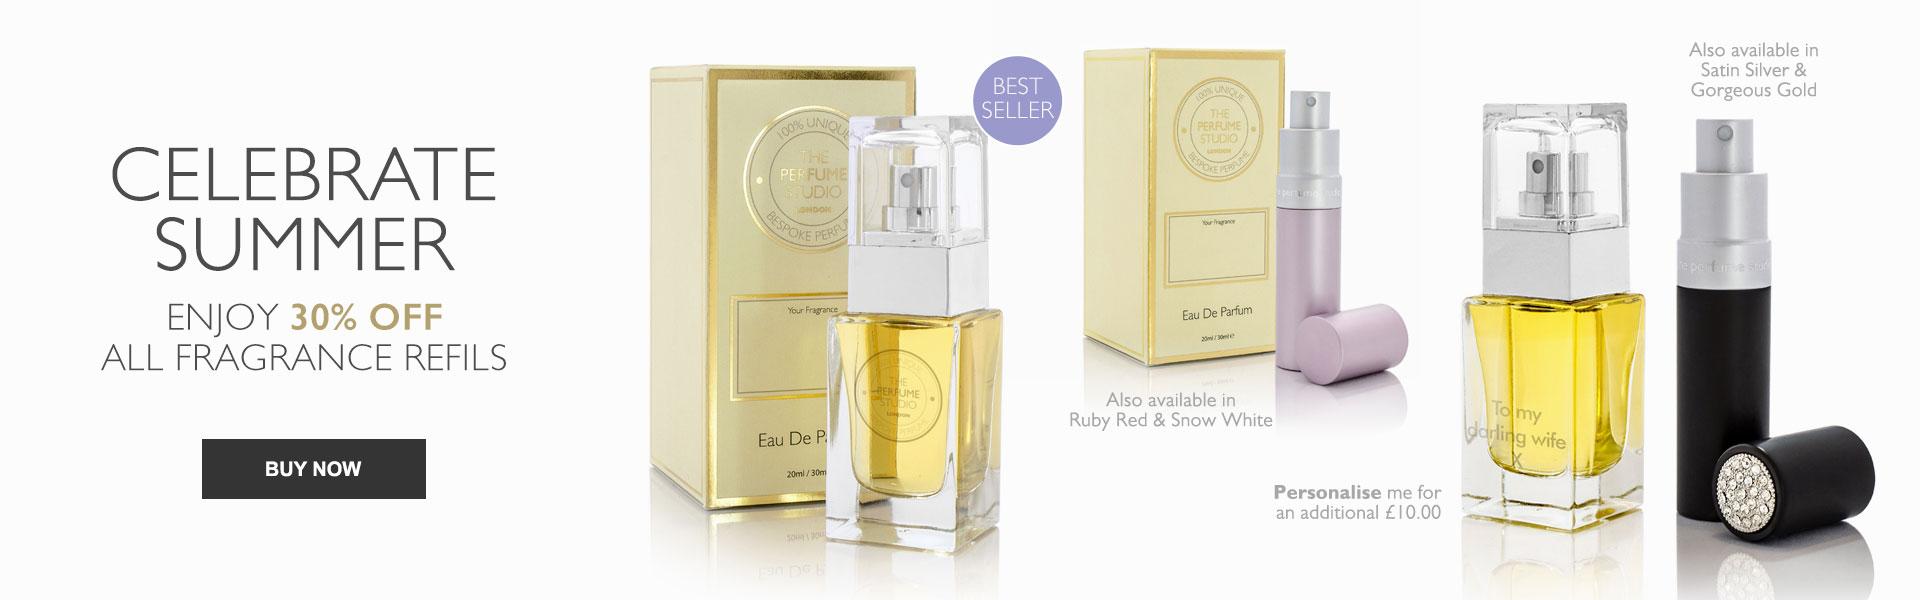 Celebrate Summer - Enjoy 30% OFF all Fragrance Refills